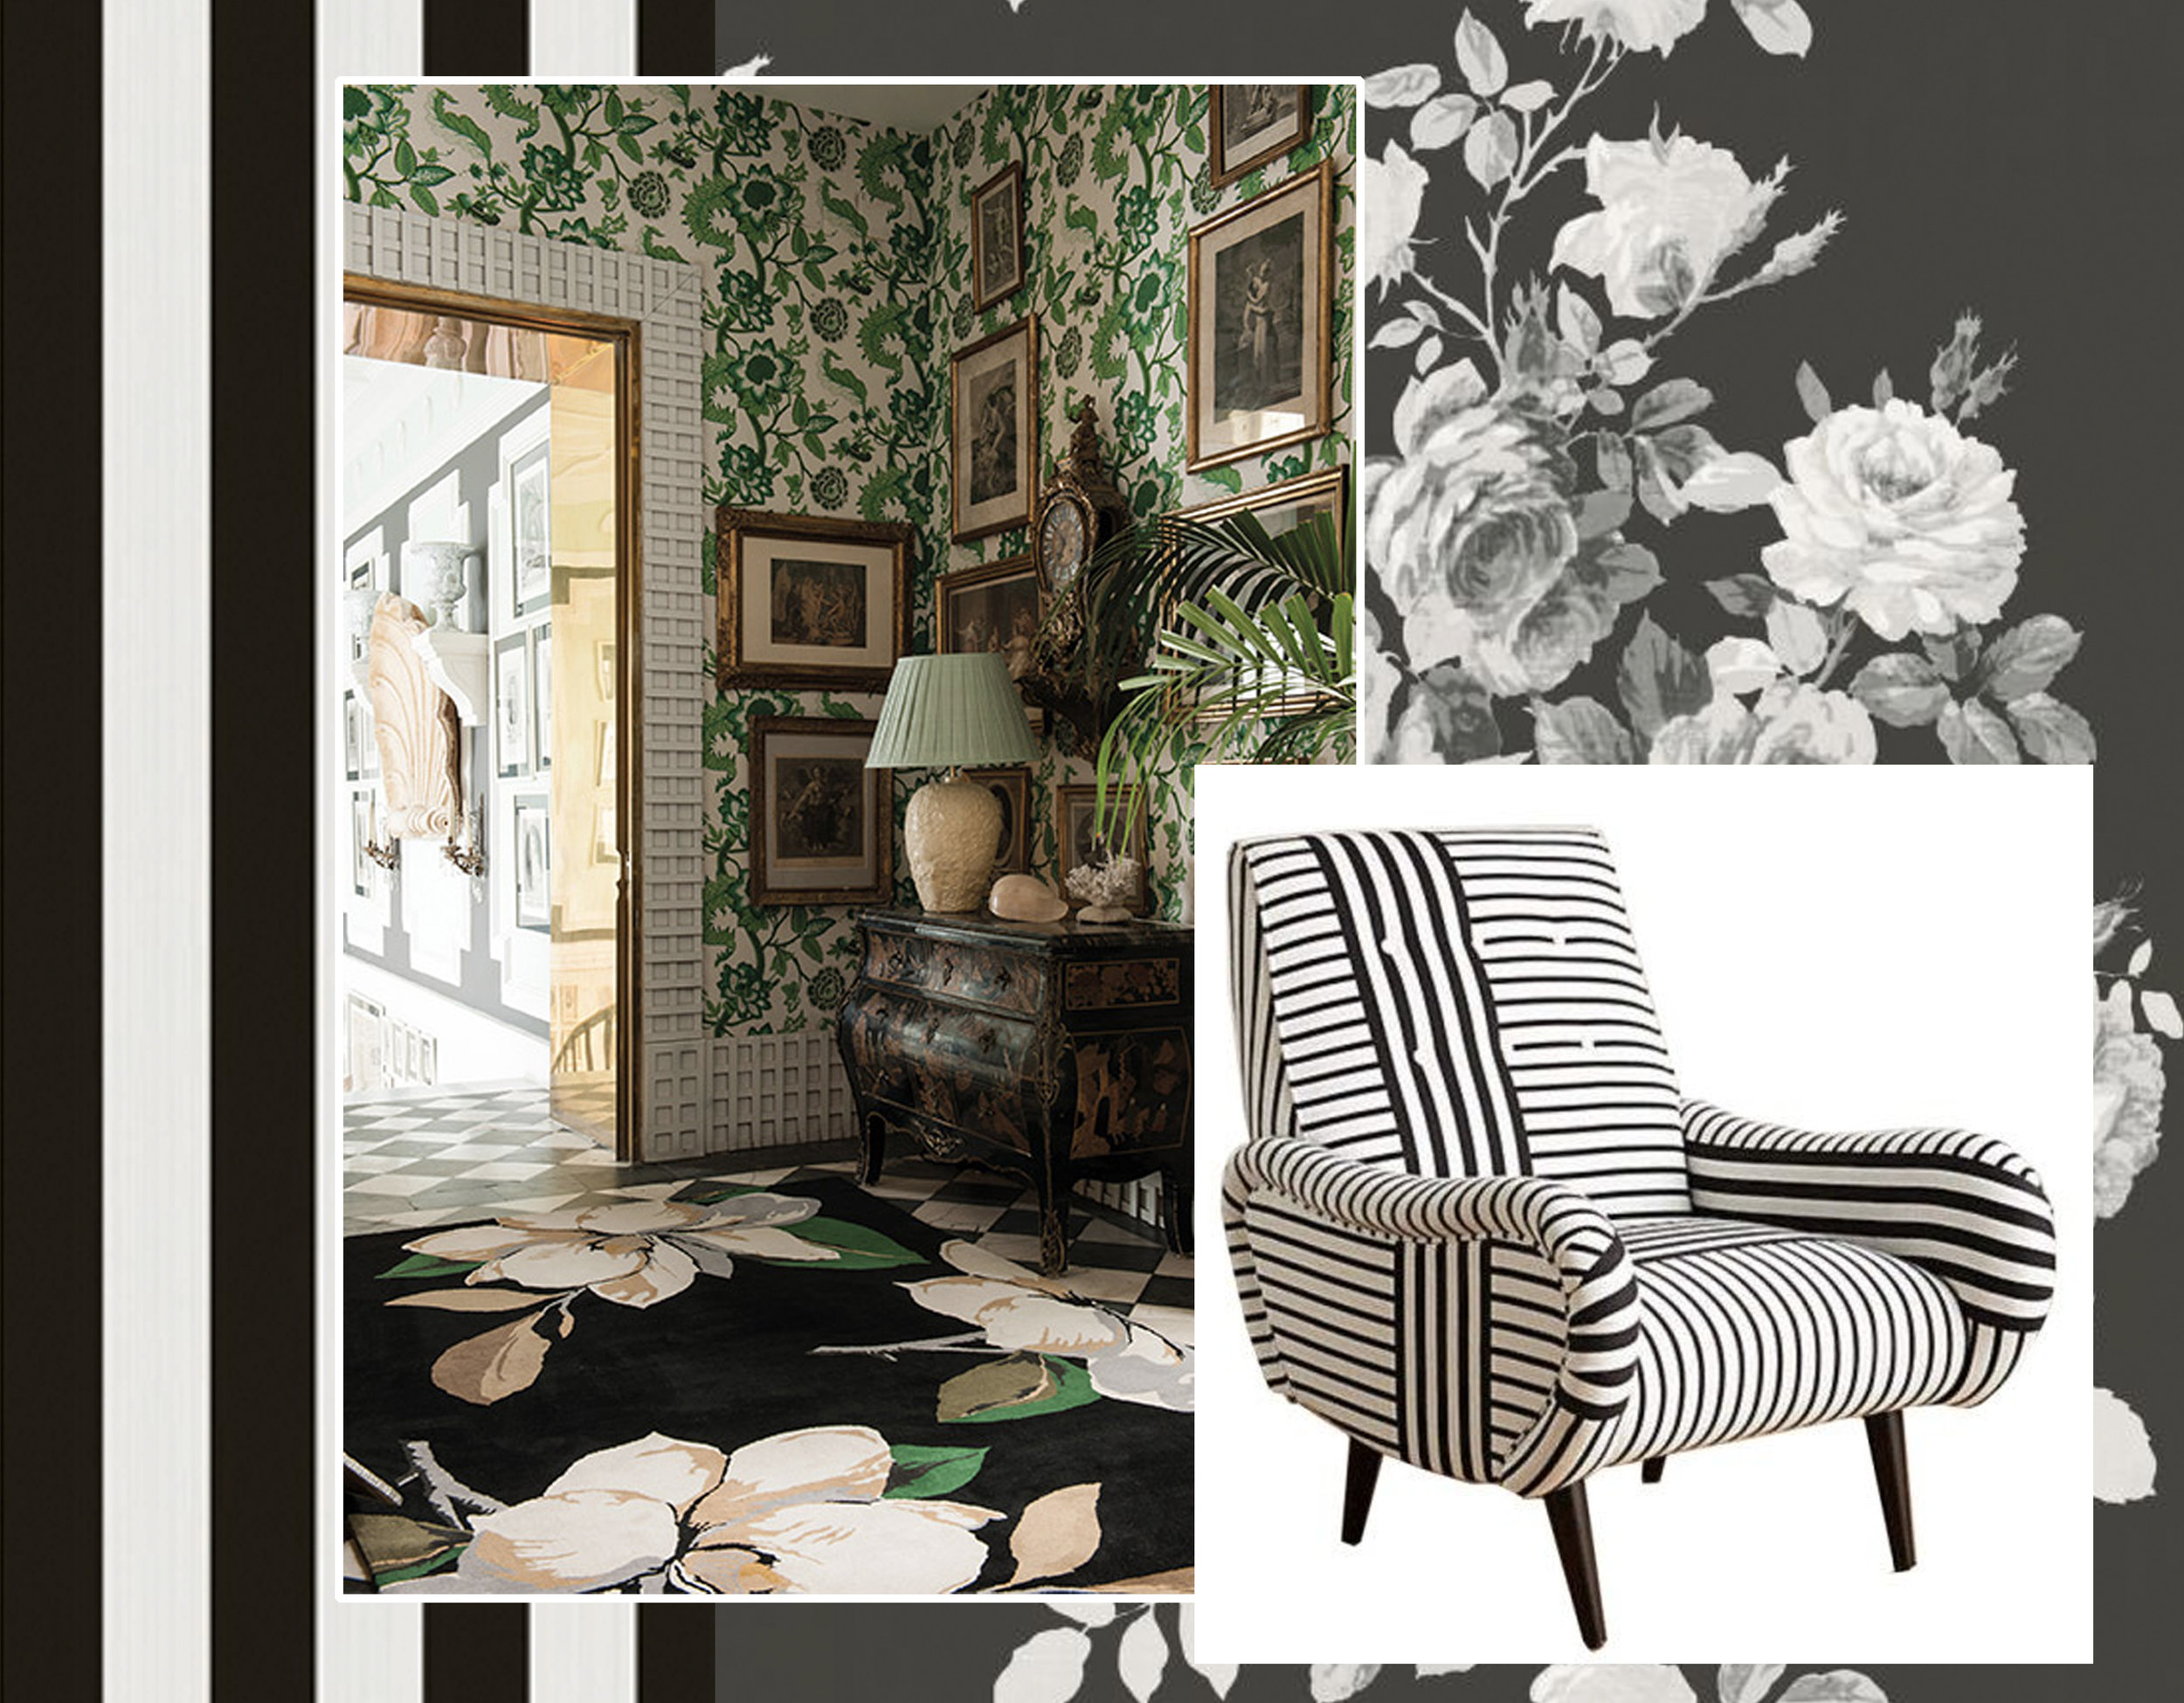 wallpaper Jaspe Stripe  Cole & Son  - Tea Rose wallpaper  York Wallcoverings  - Magnolia rug  The Rug Company  - armchair via  Sarah Baynes